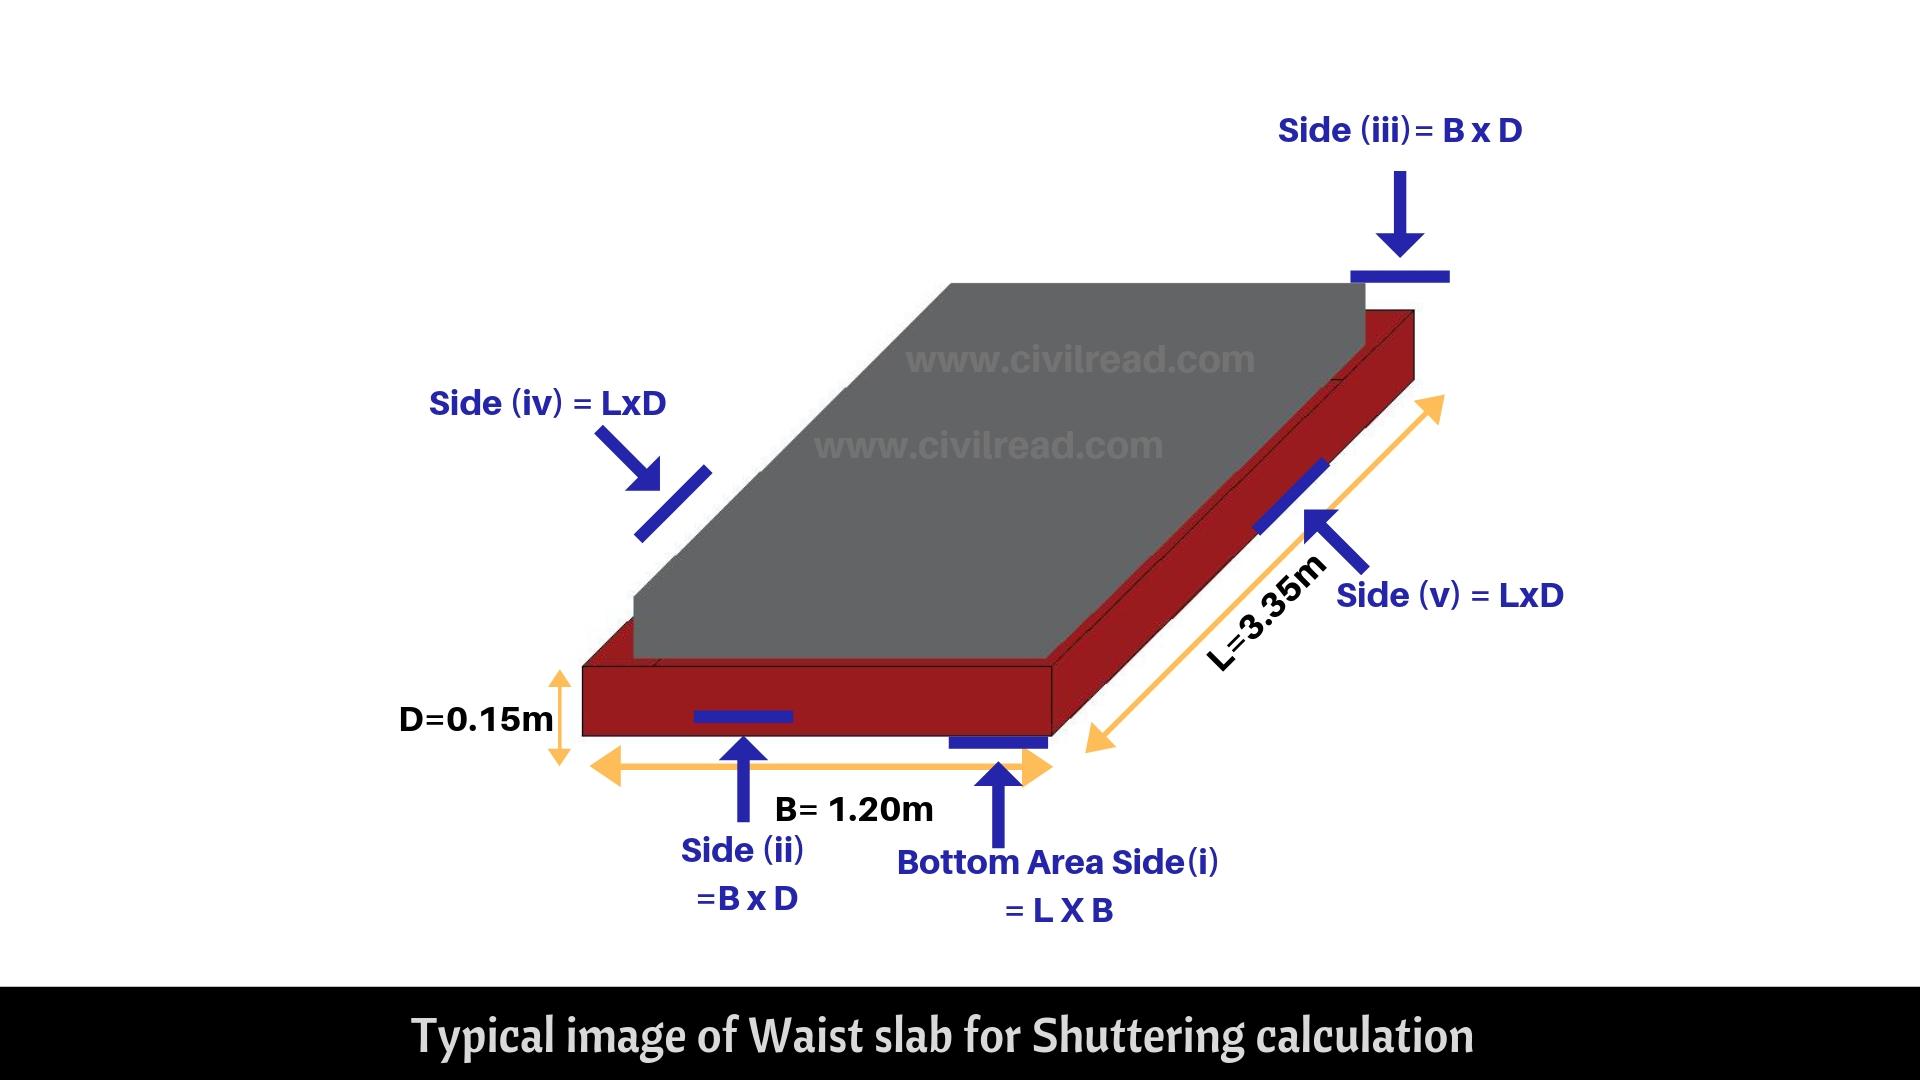 Waist slab shuttering